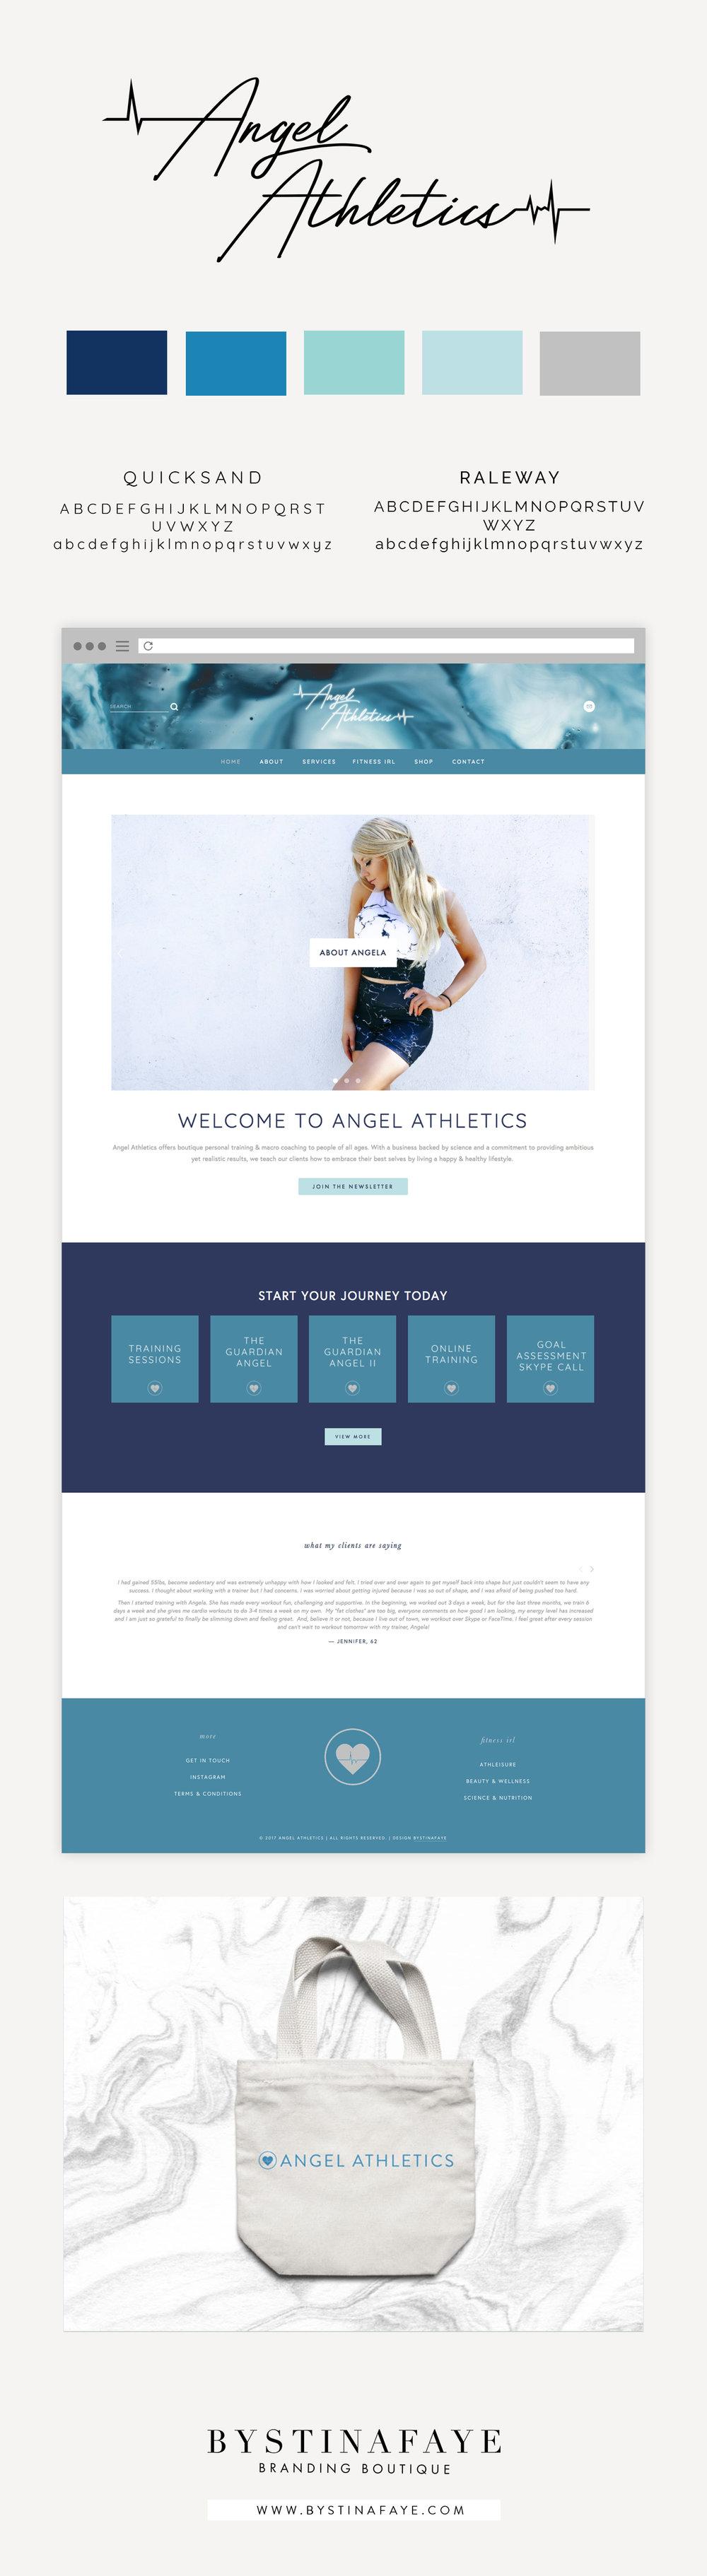 Angel Athletics